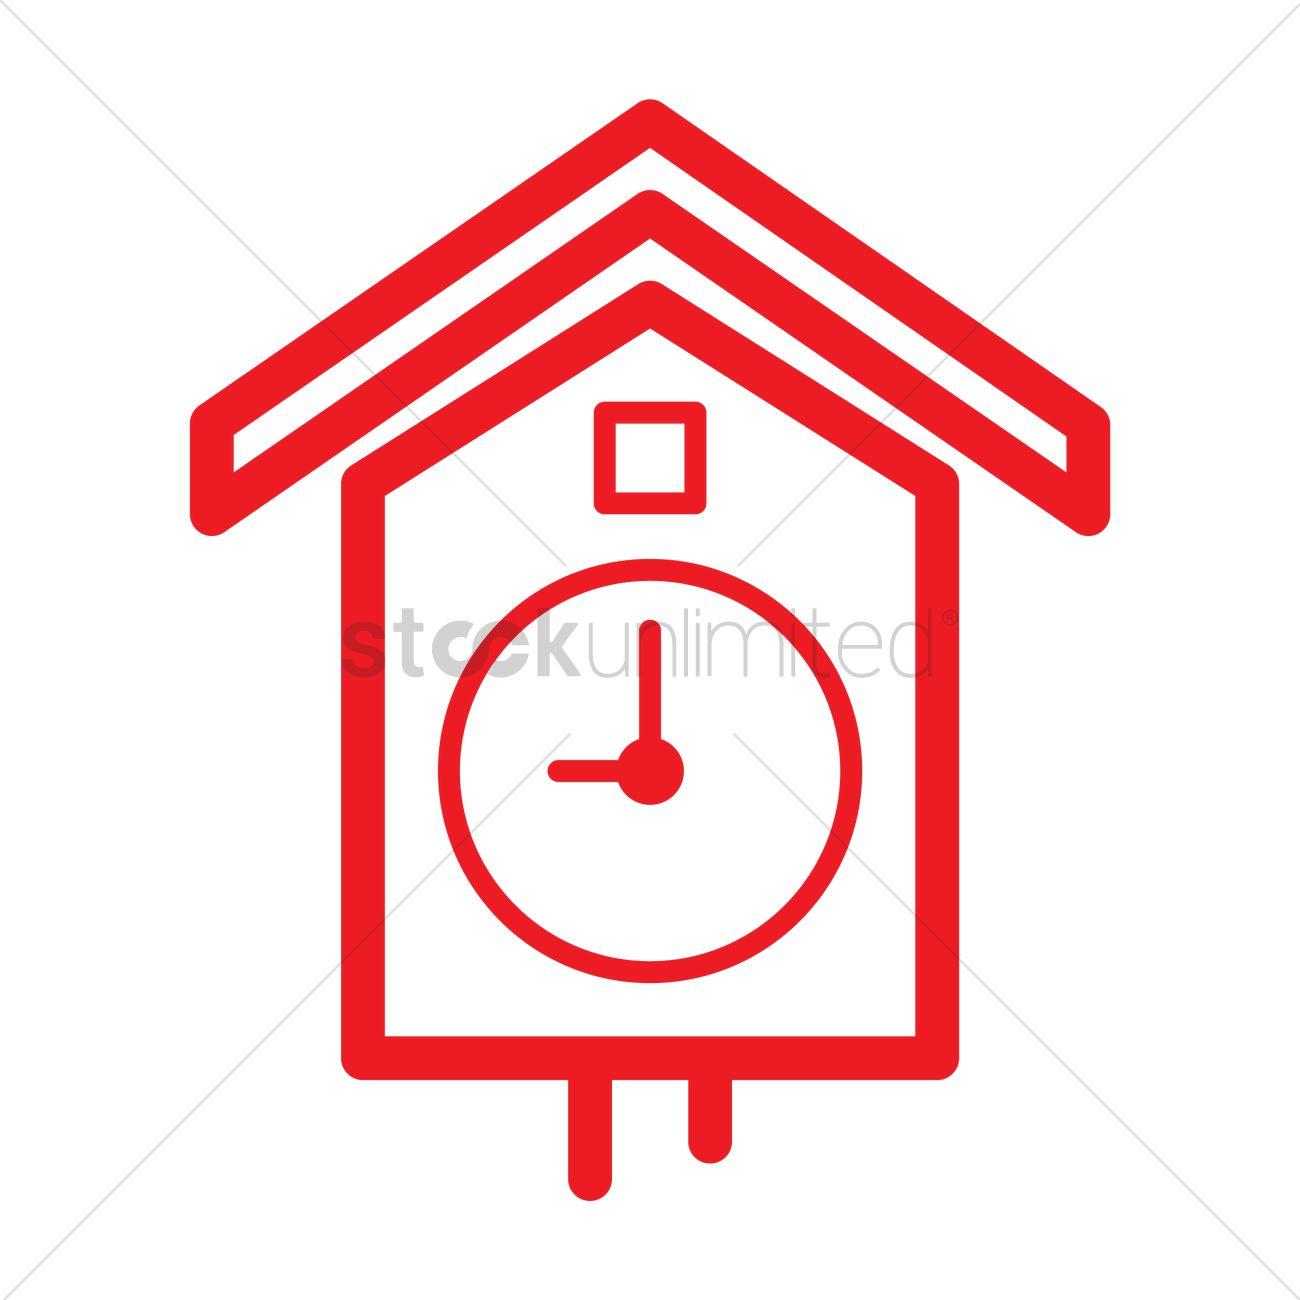 Pendulum clock icon Vector Image - 1999497 | StockUnlimited